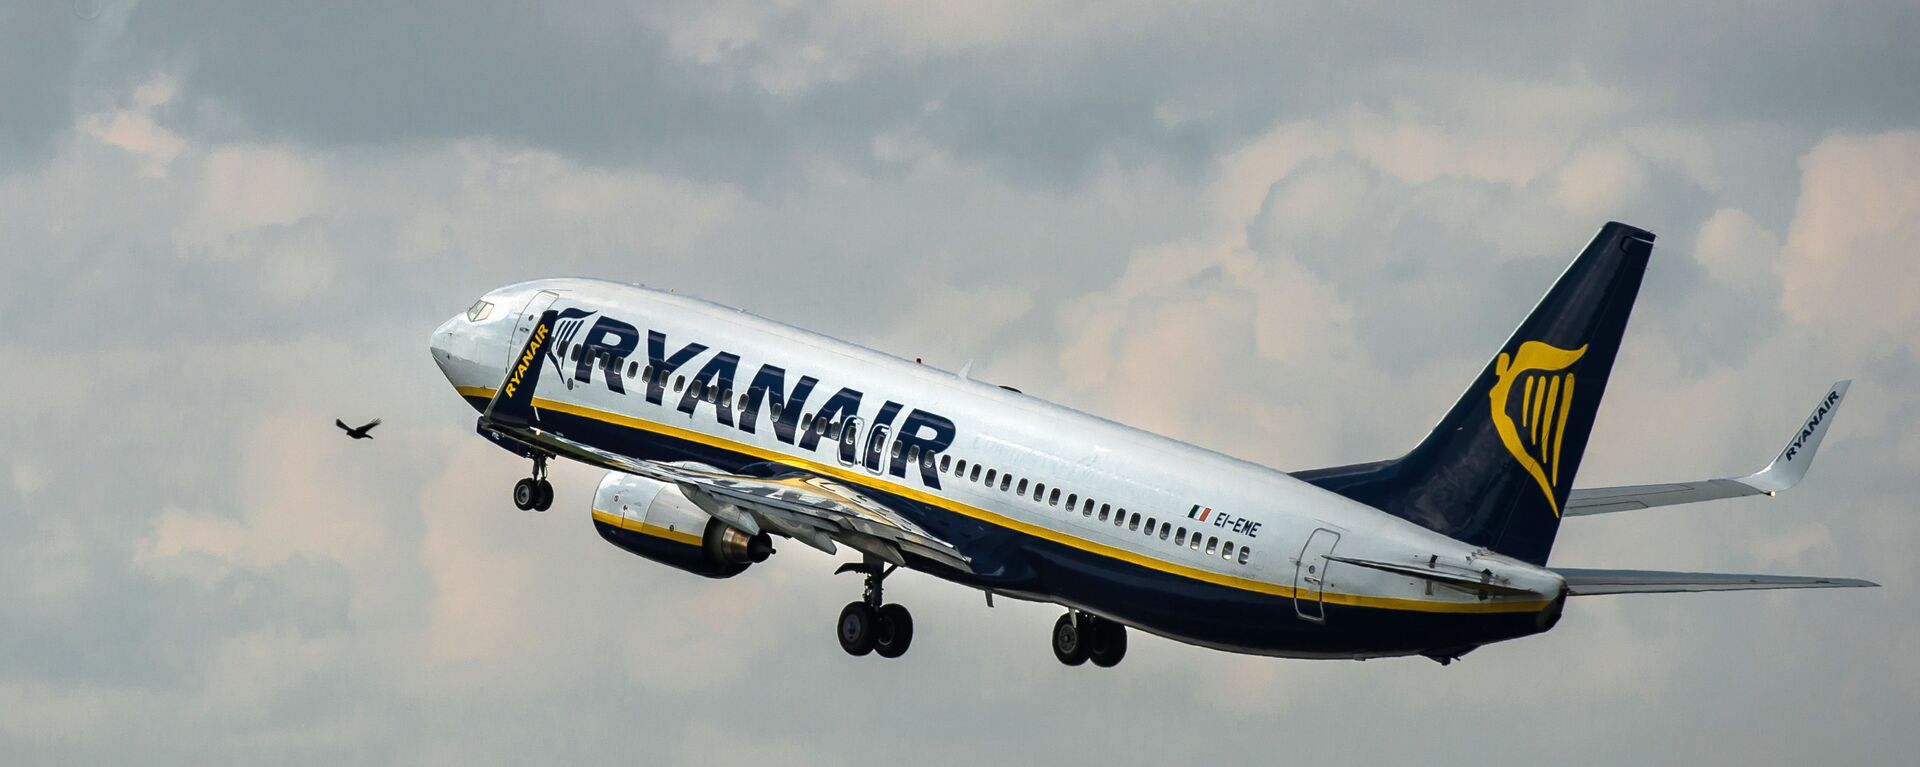 Aereo Ryanair  - Sputnik Italia, 1920, 29.05.2021